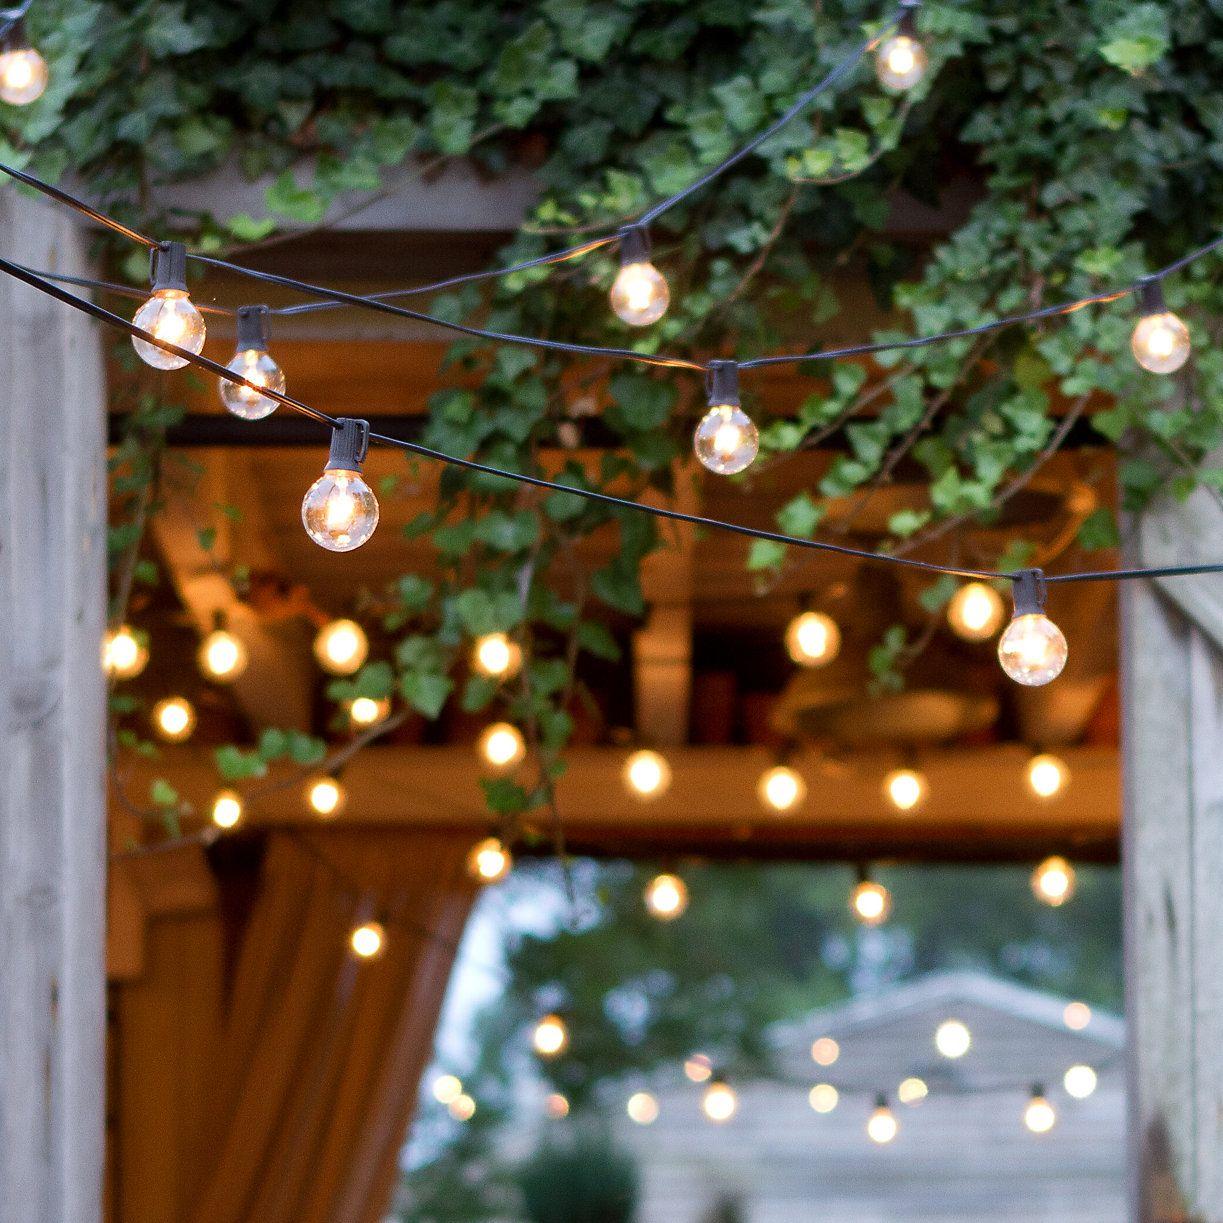 Stargazer Globe Lights in Outdoor Living Lighting + Lanterns at Terrain #PinMyDreamBackyard & Stargazer Globe Lights | Pinterest | Festival lights Outdoor living ...